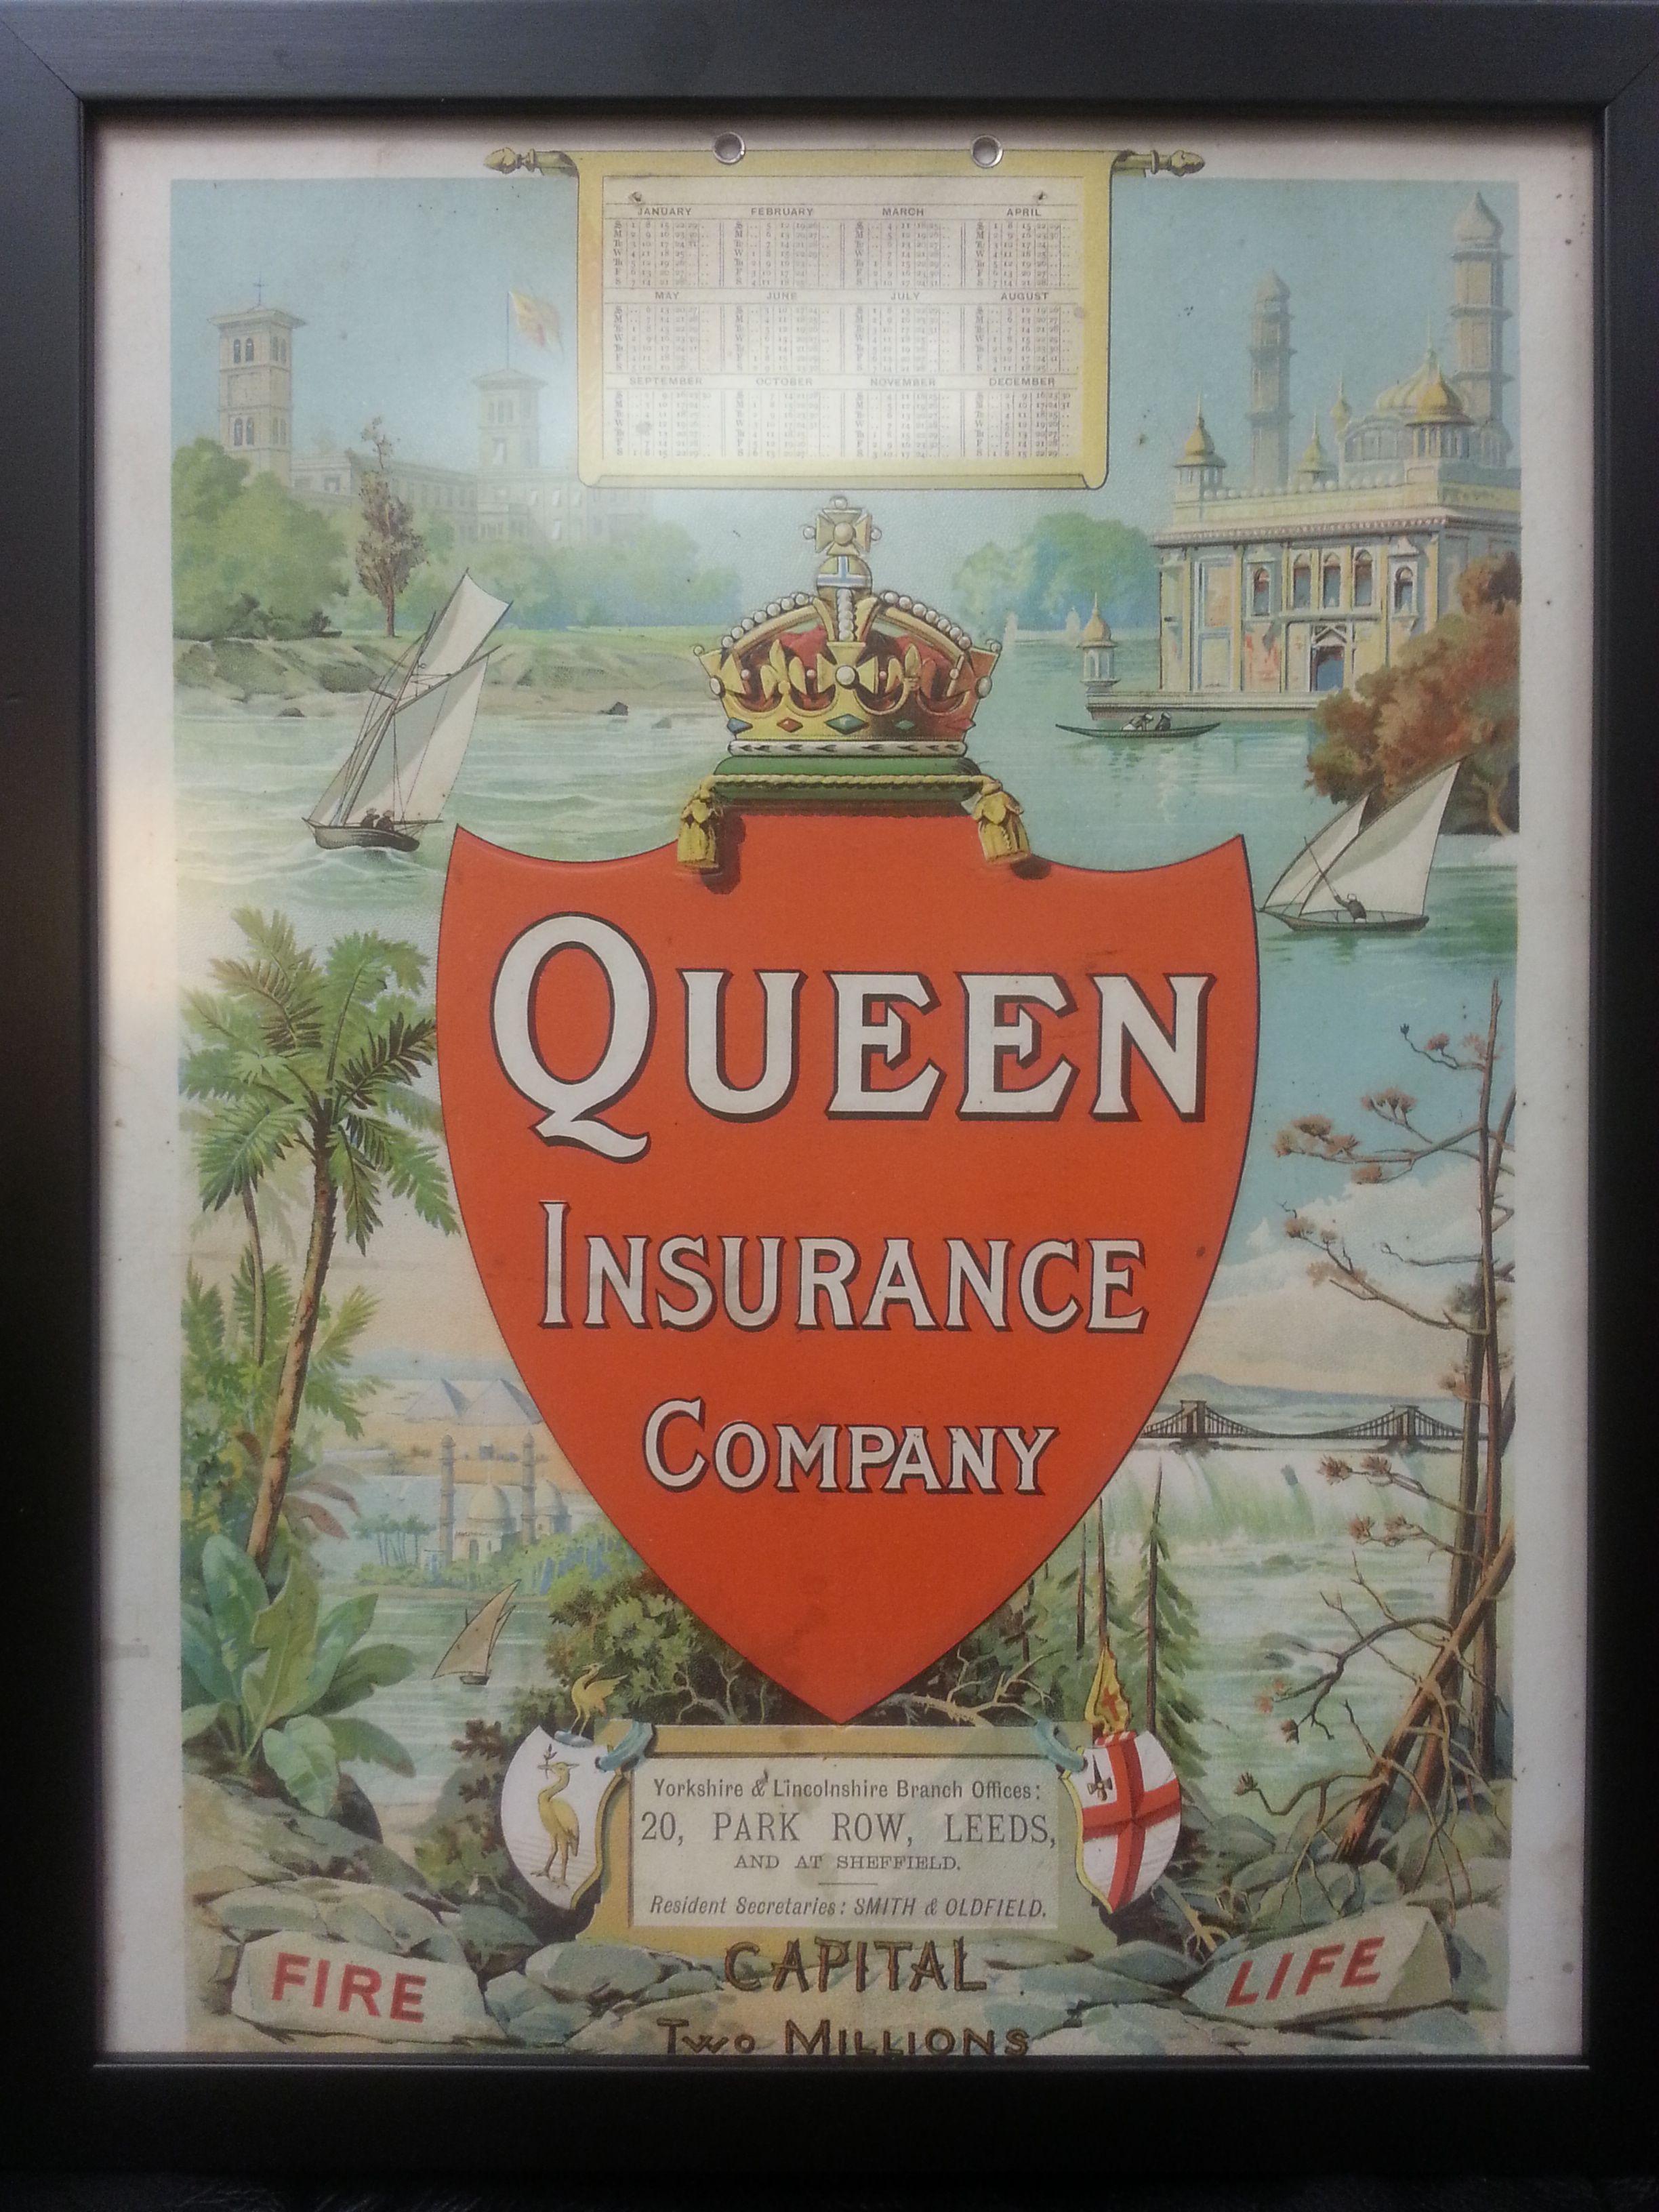 Queen Insurance Company | Antique Insurance & Fire Signs | Pinterest ...